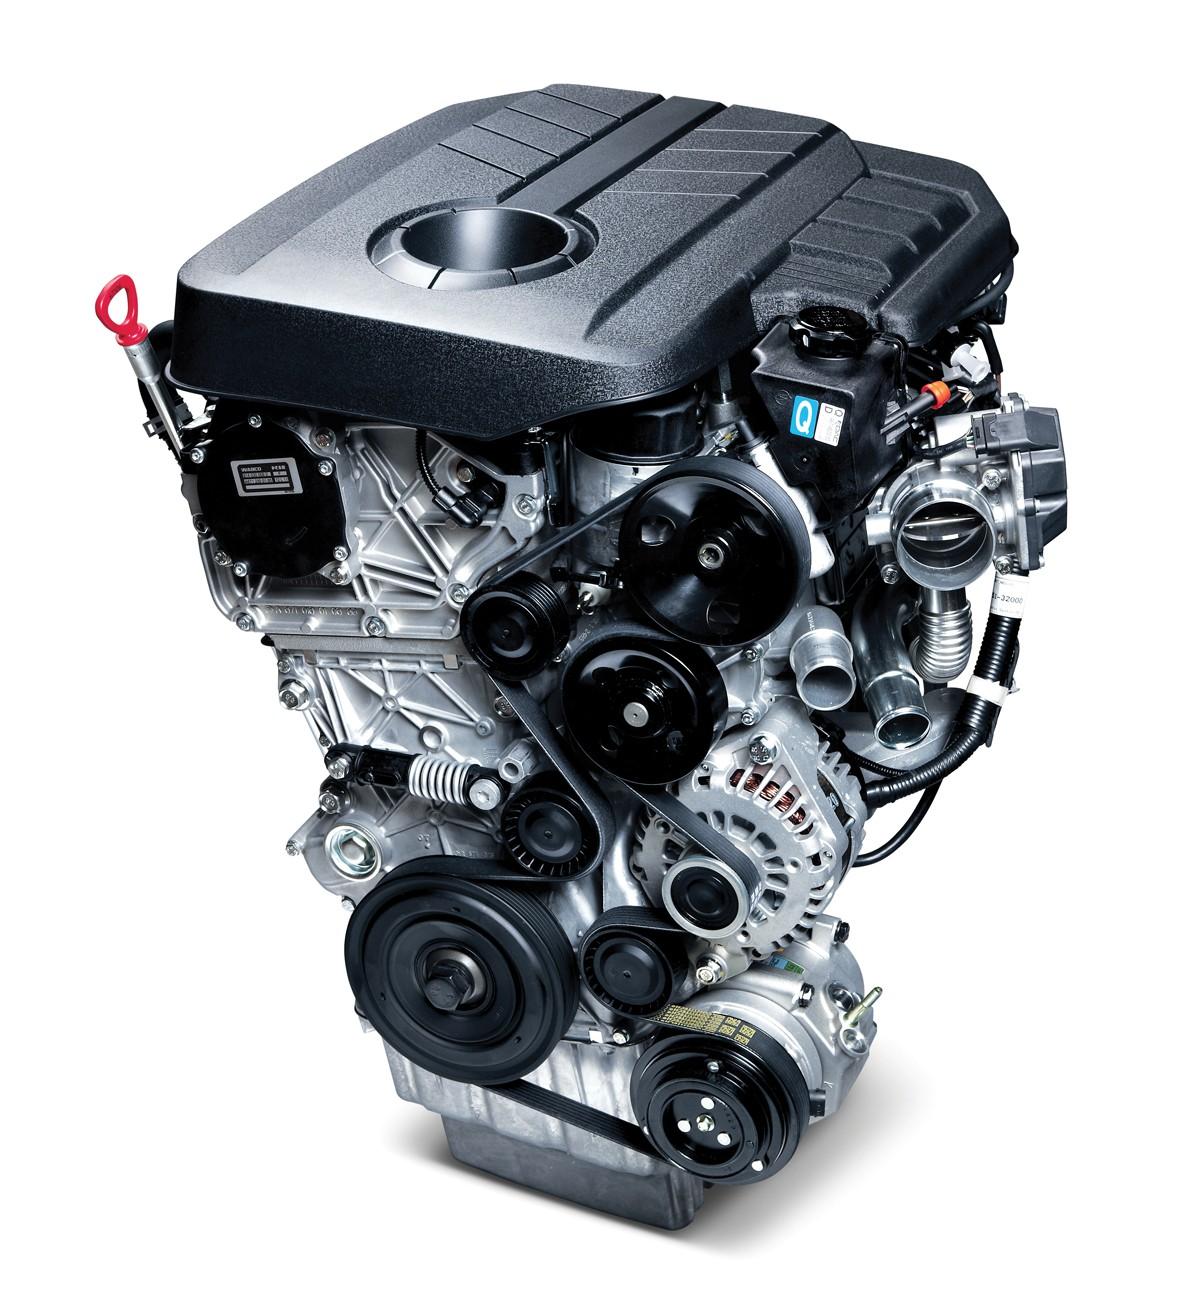 SsangYong Tivoli - Zuinige benzinemotor en dieselmotor